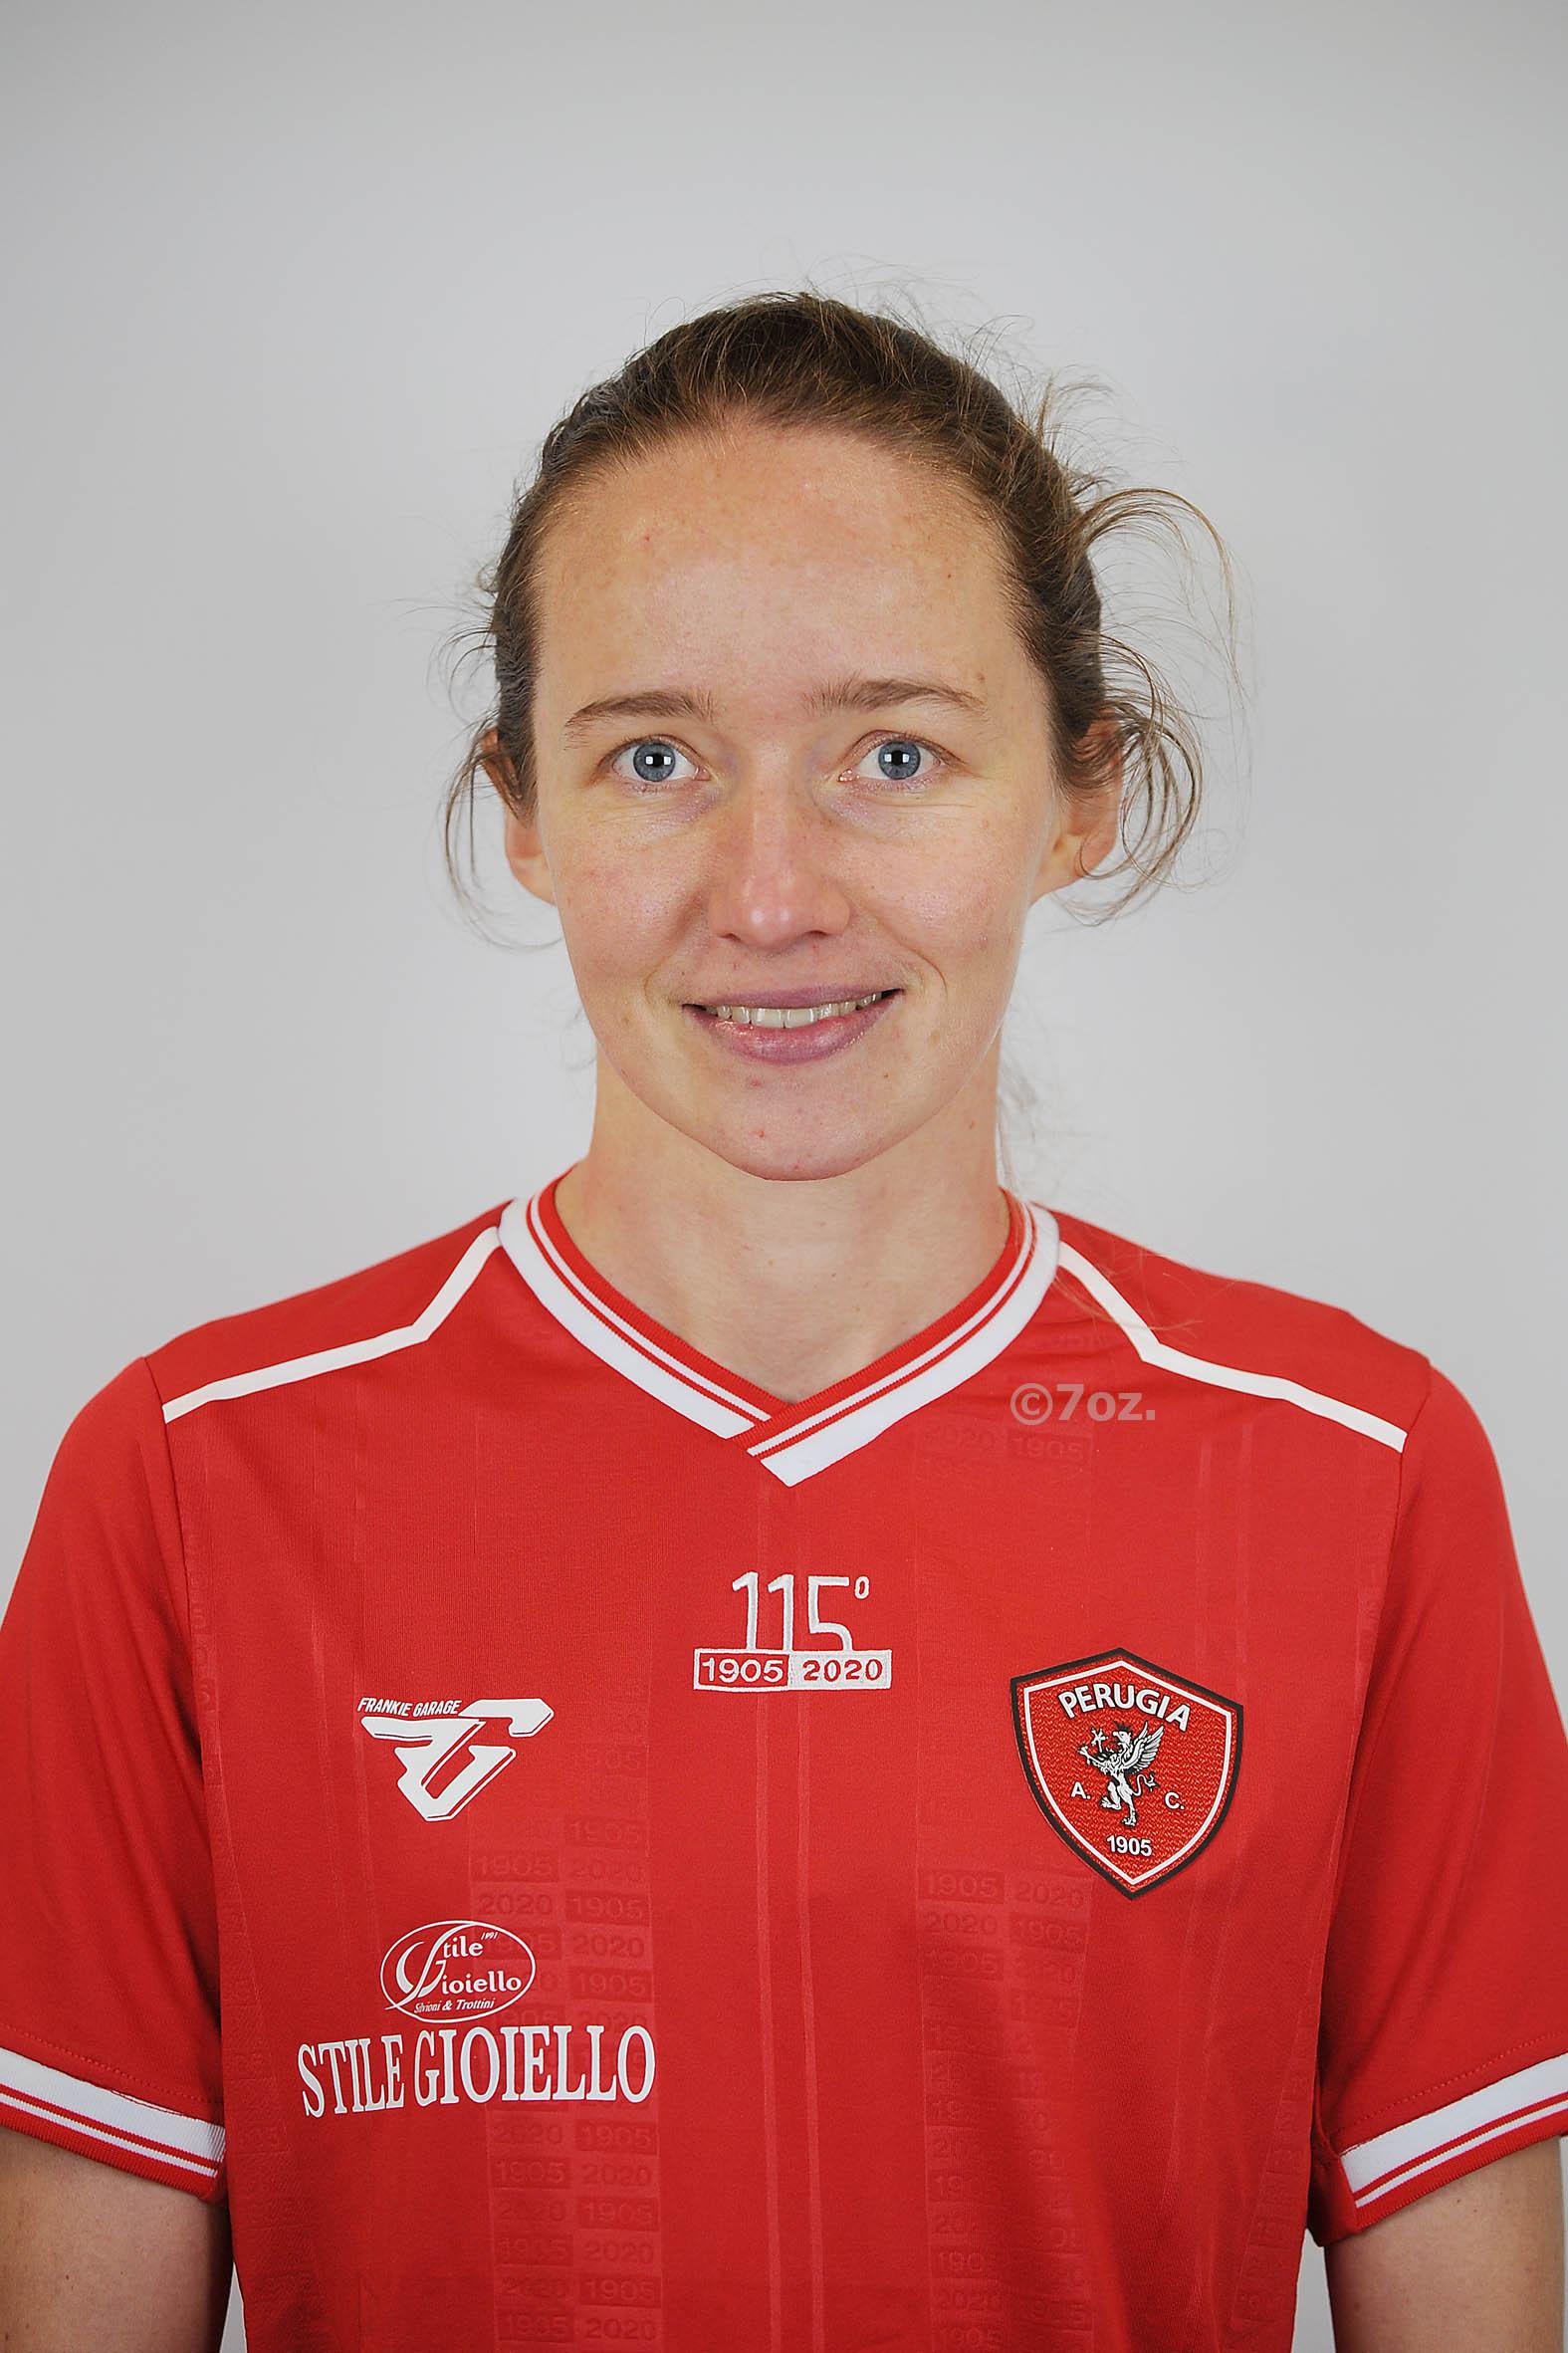 Marie Benoist LucyDifensore- A.C. Perugia Calcio